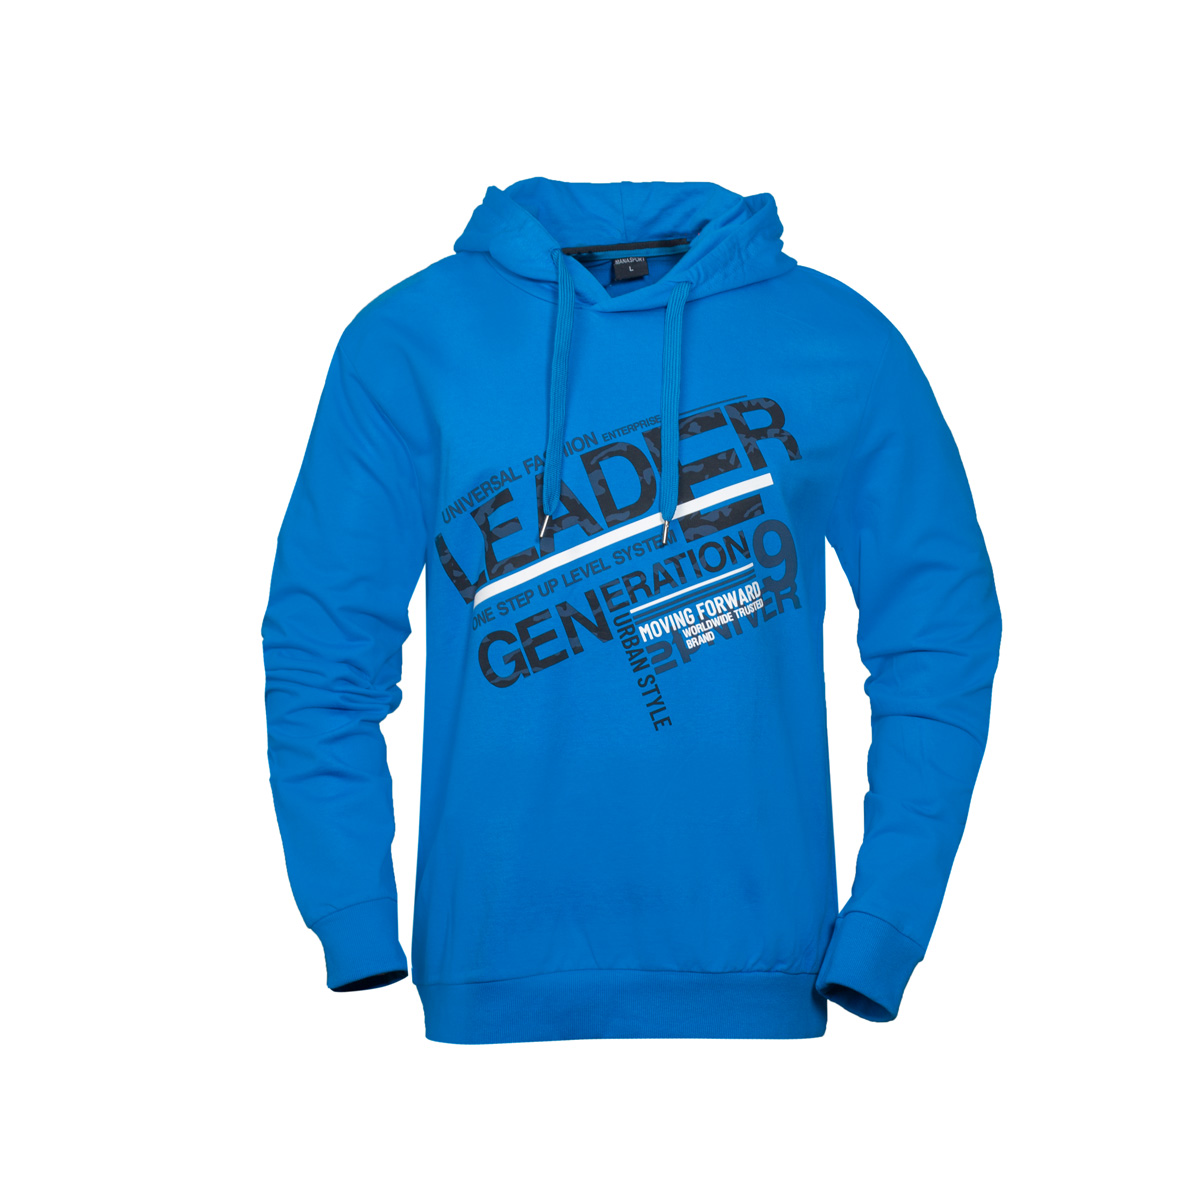 Moški pulover, modra